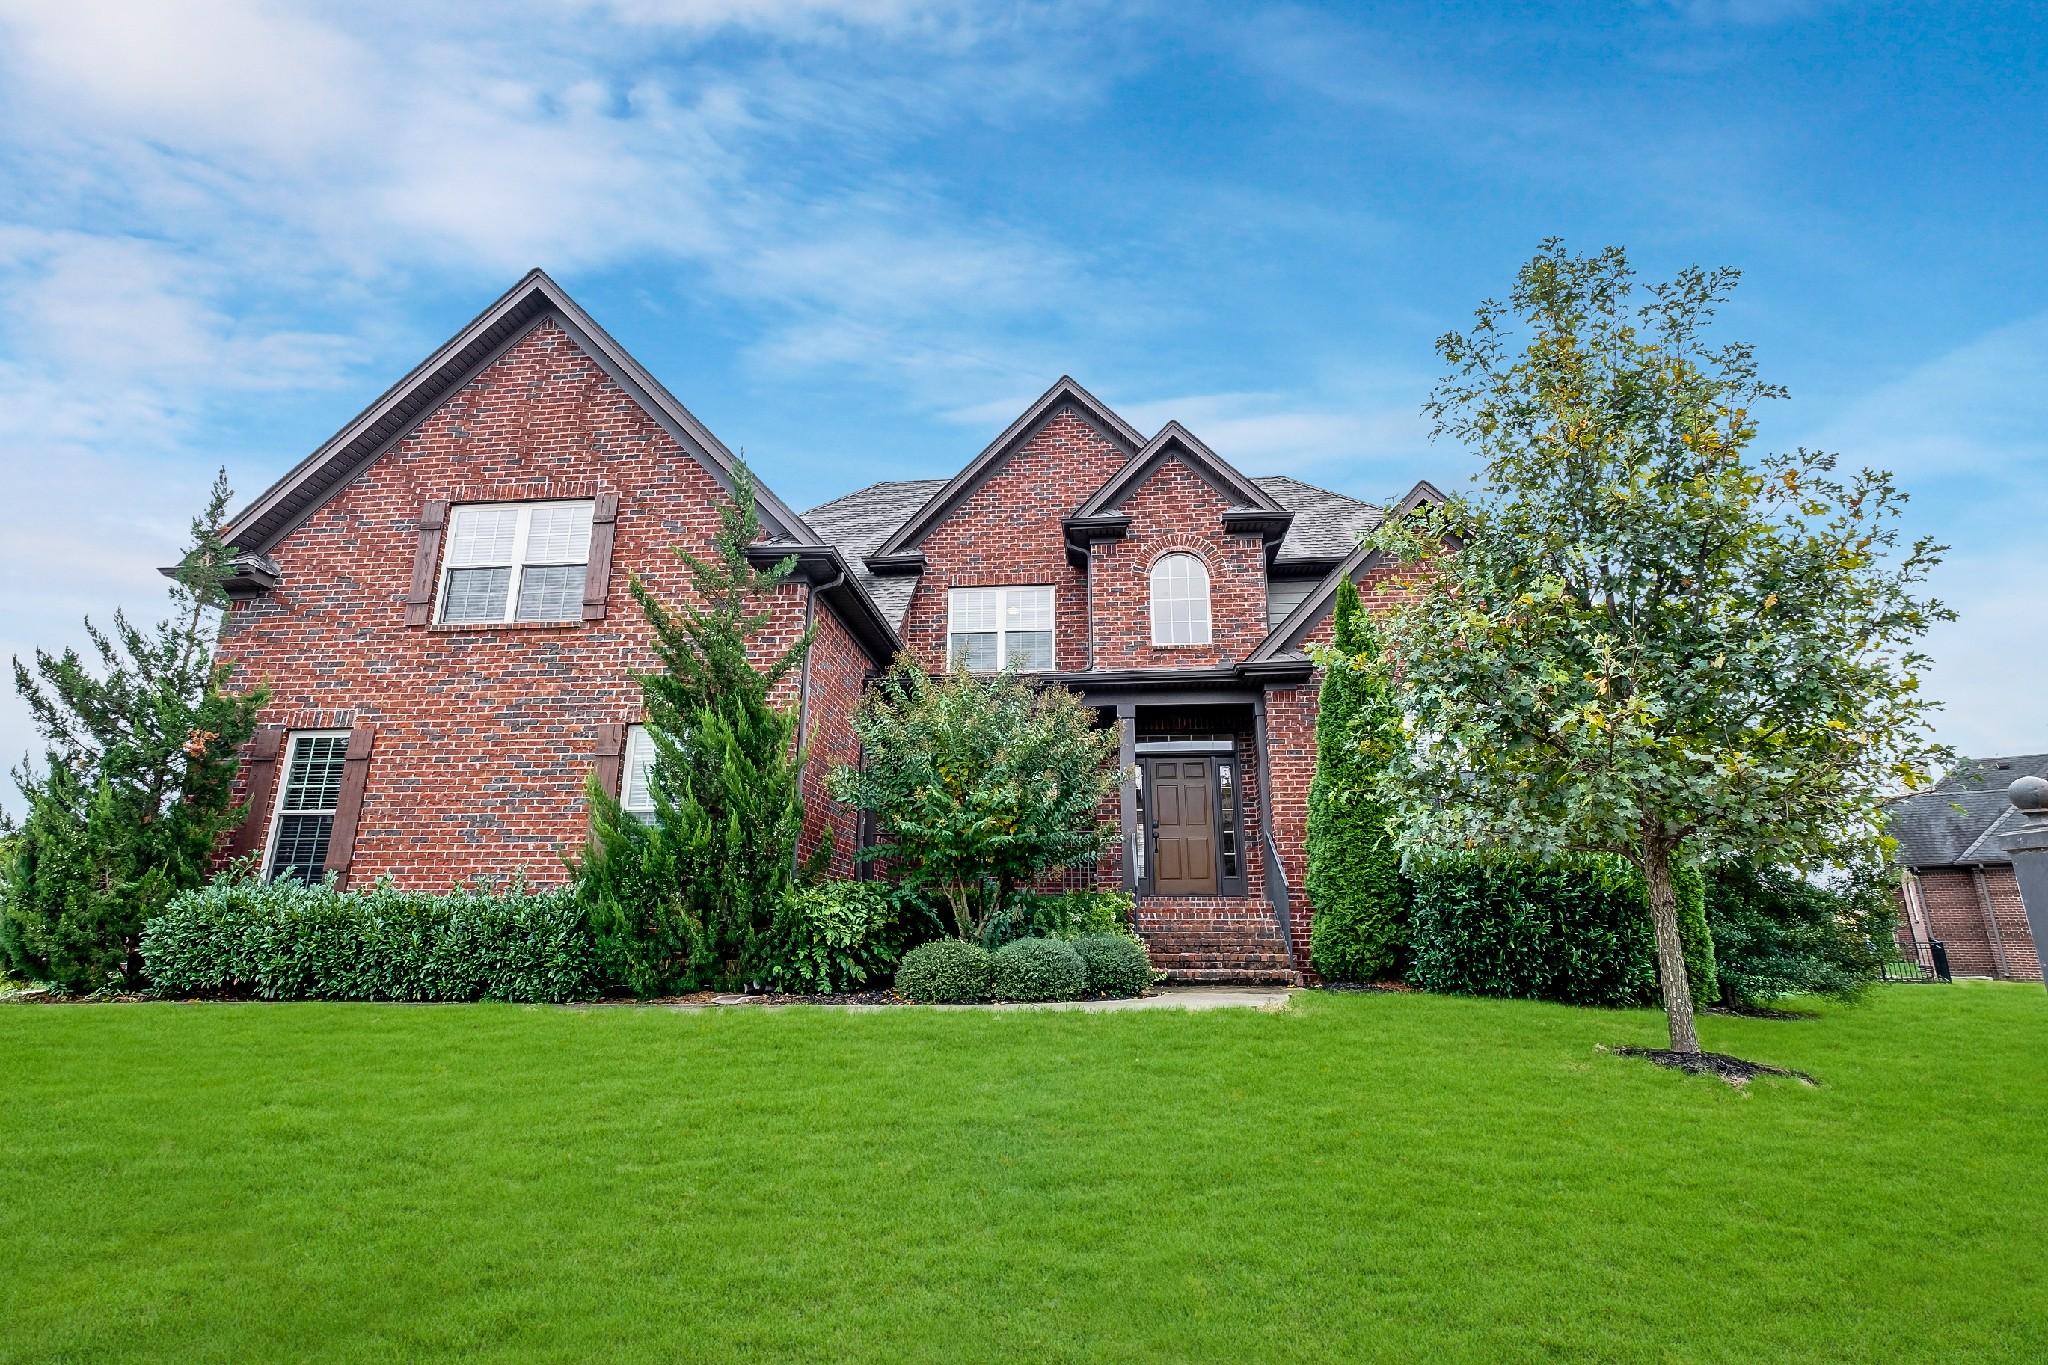 8055 Fenwick Ln, Spring Hill, TN 37174 - Spring Hill, TN real estate listing